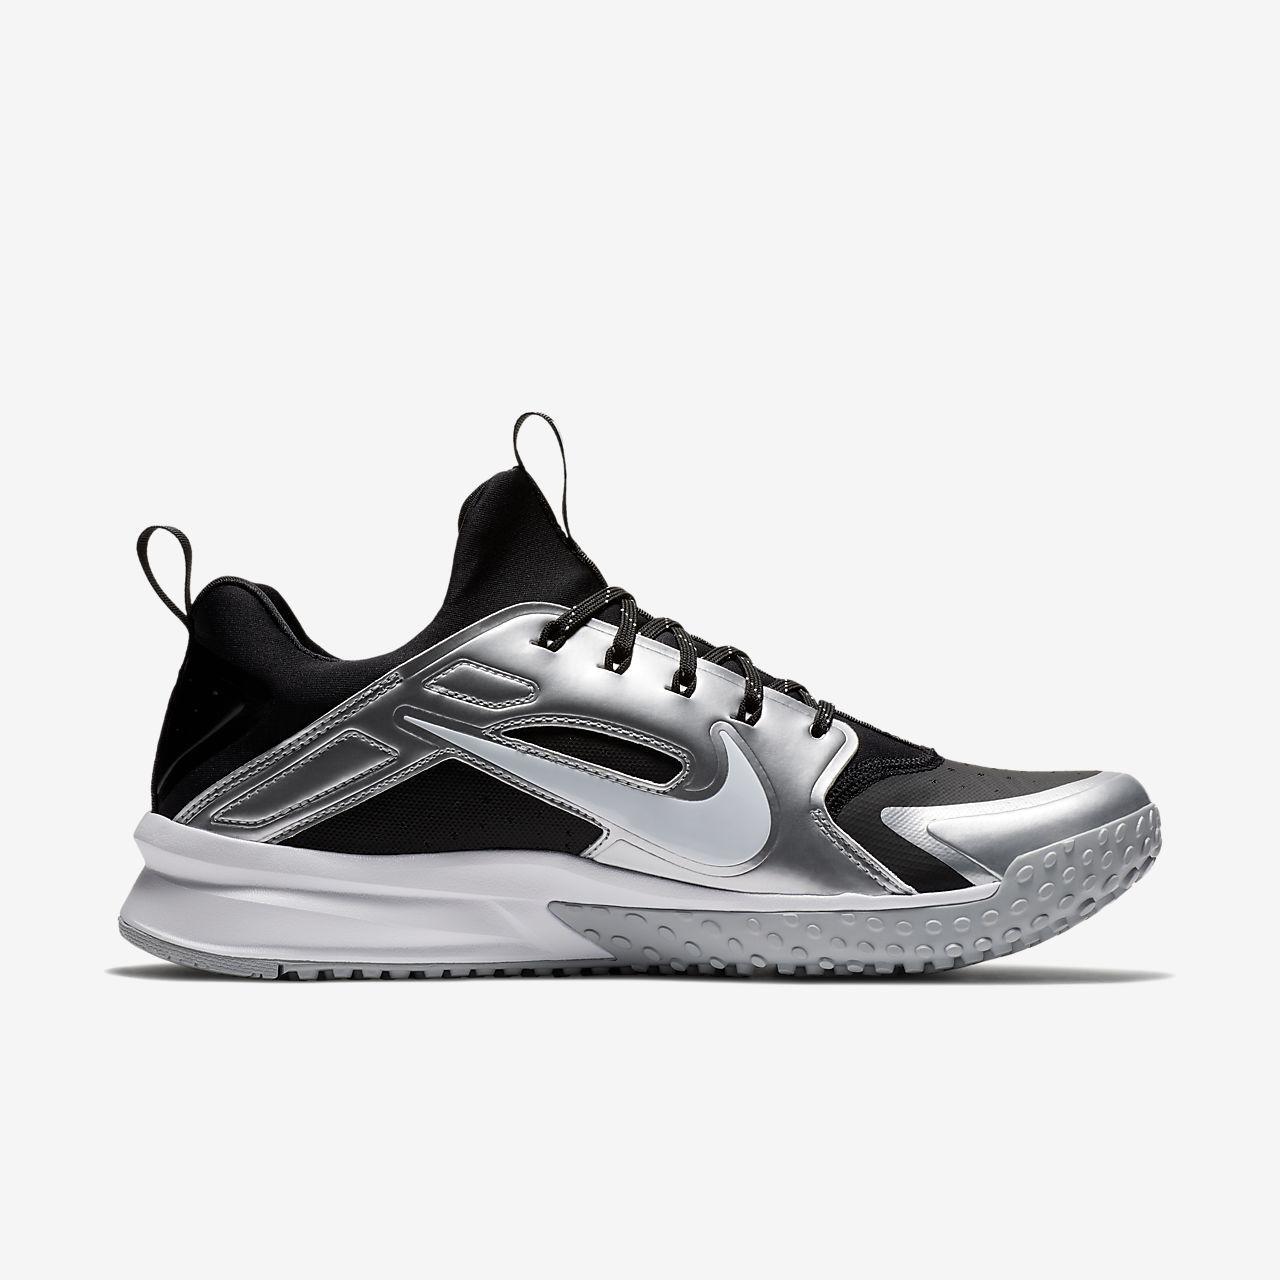 nike silver scarpe da tennis usanza nike huarache baseball vprege repnik